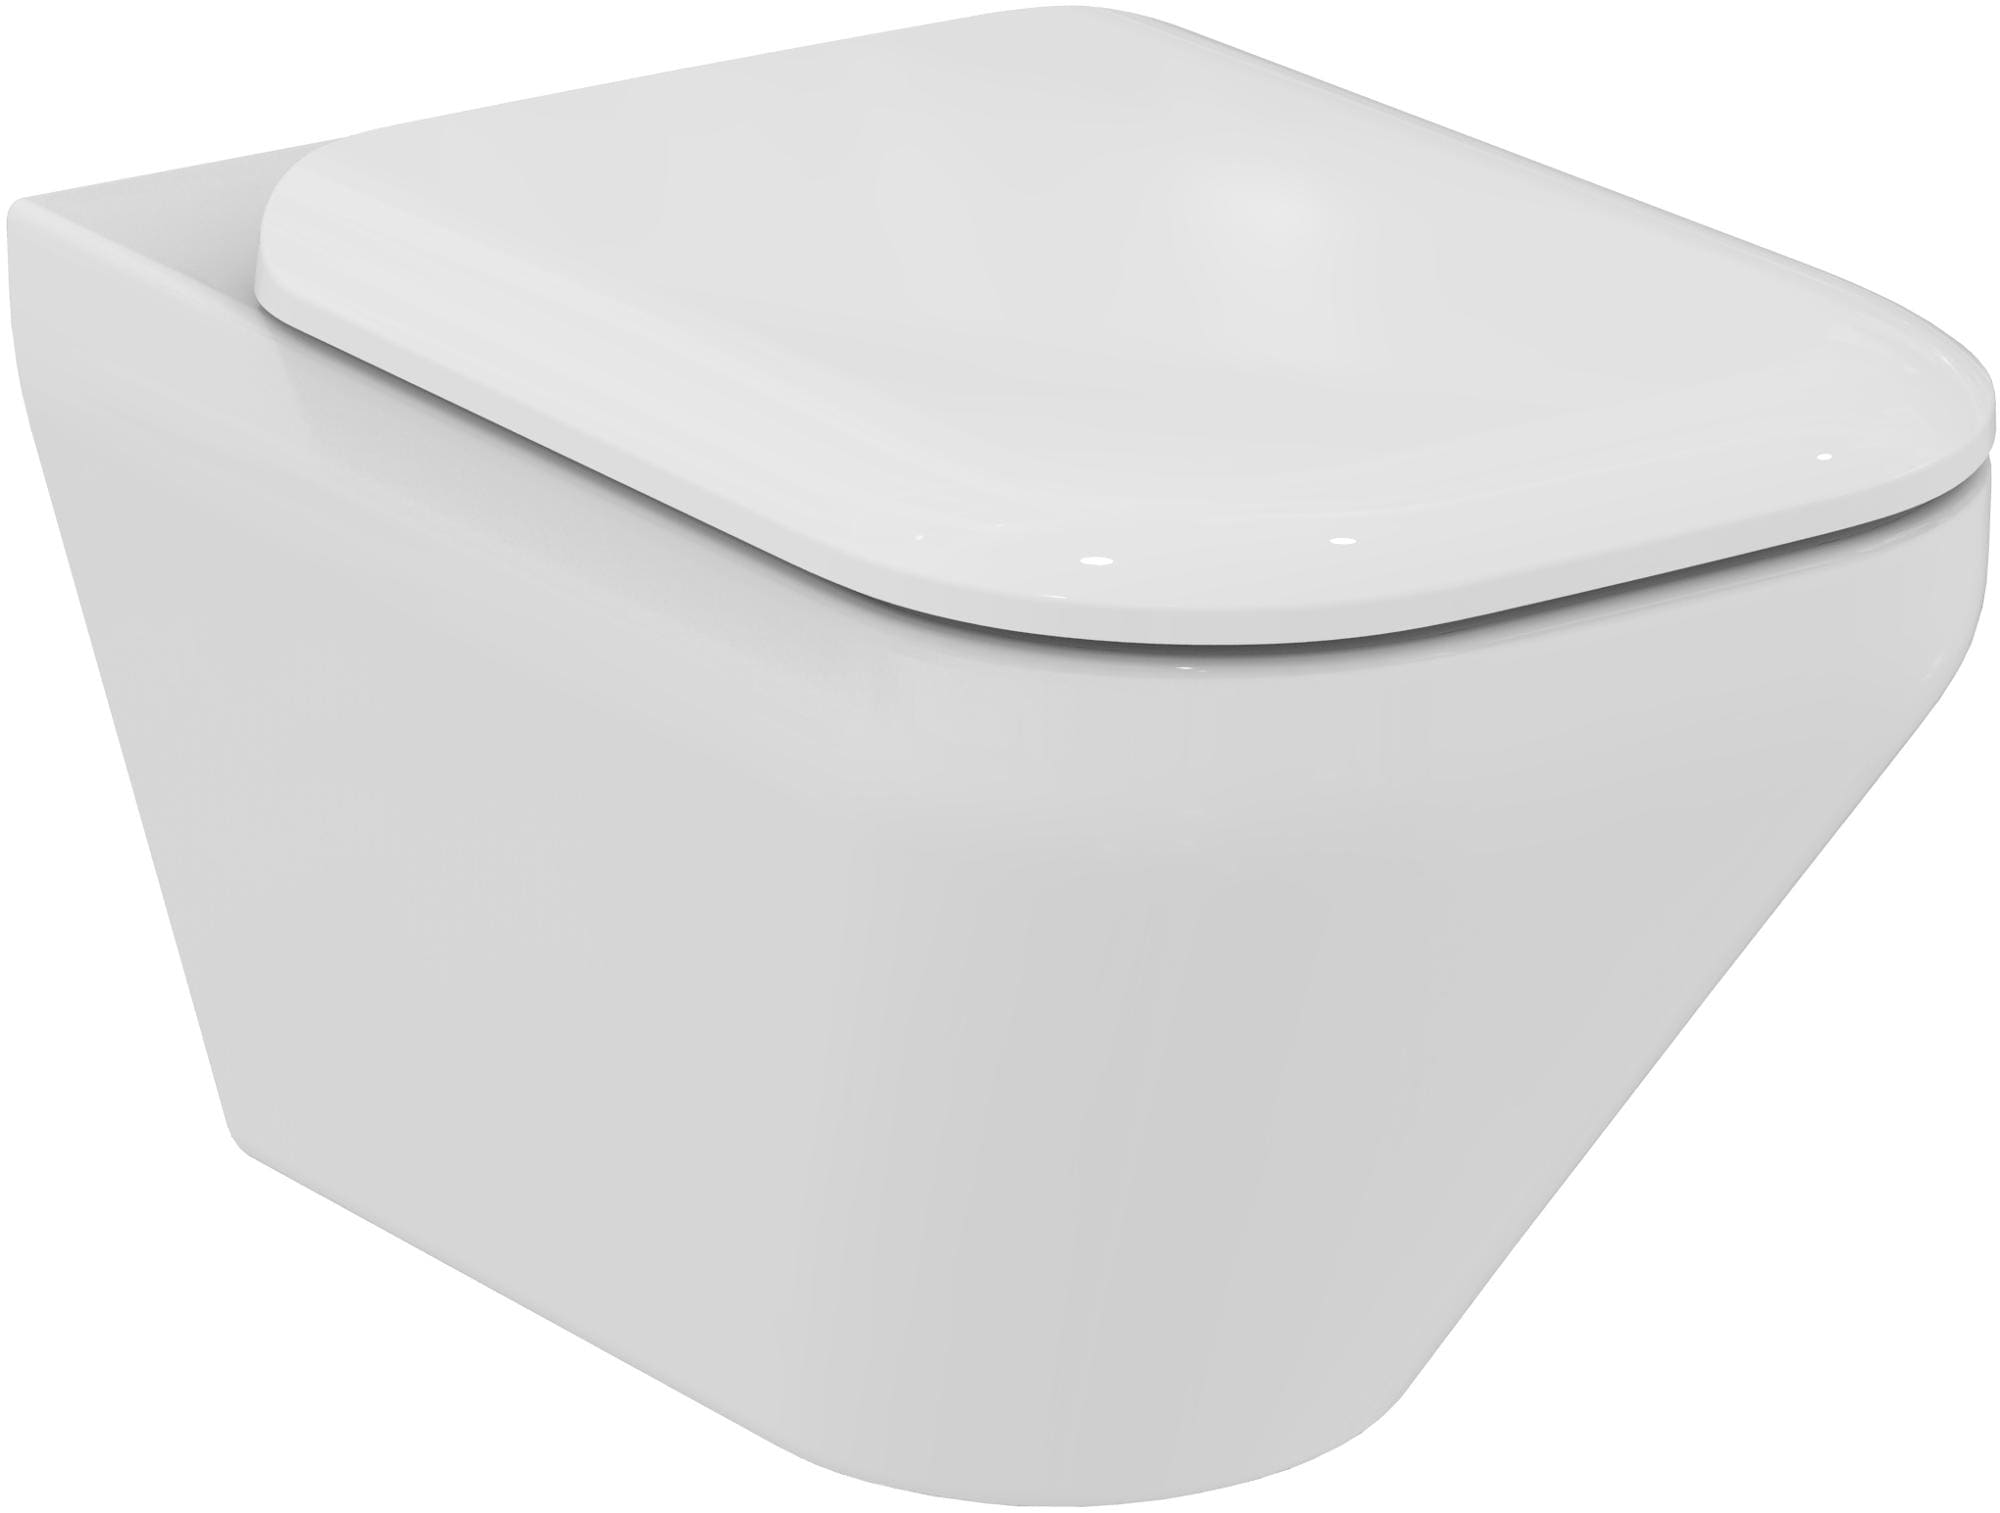 Extrem Ideal Standard Tonic II Wand-WC ohne Spülrand, weiß (K316301) von QJ61